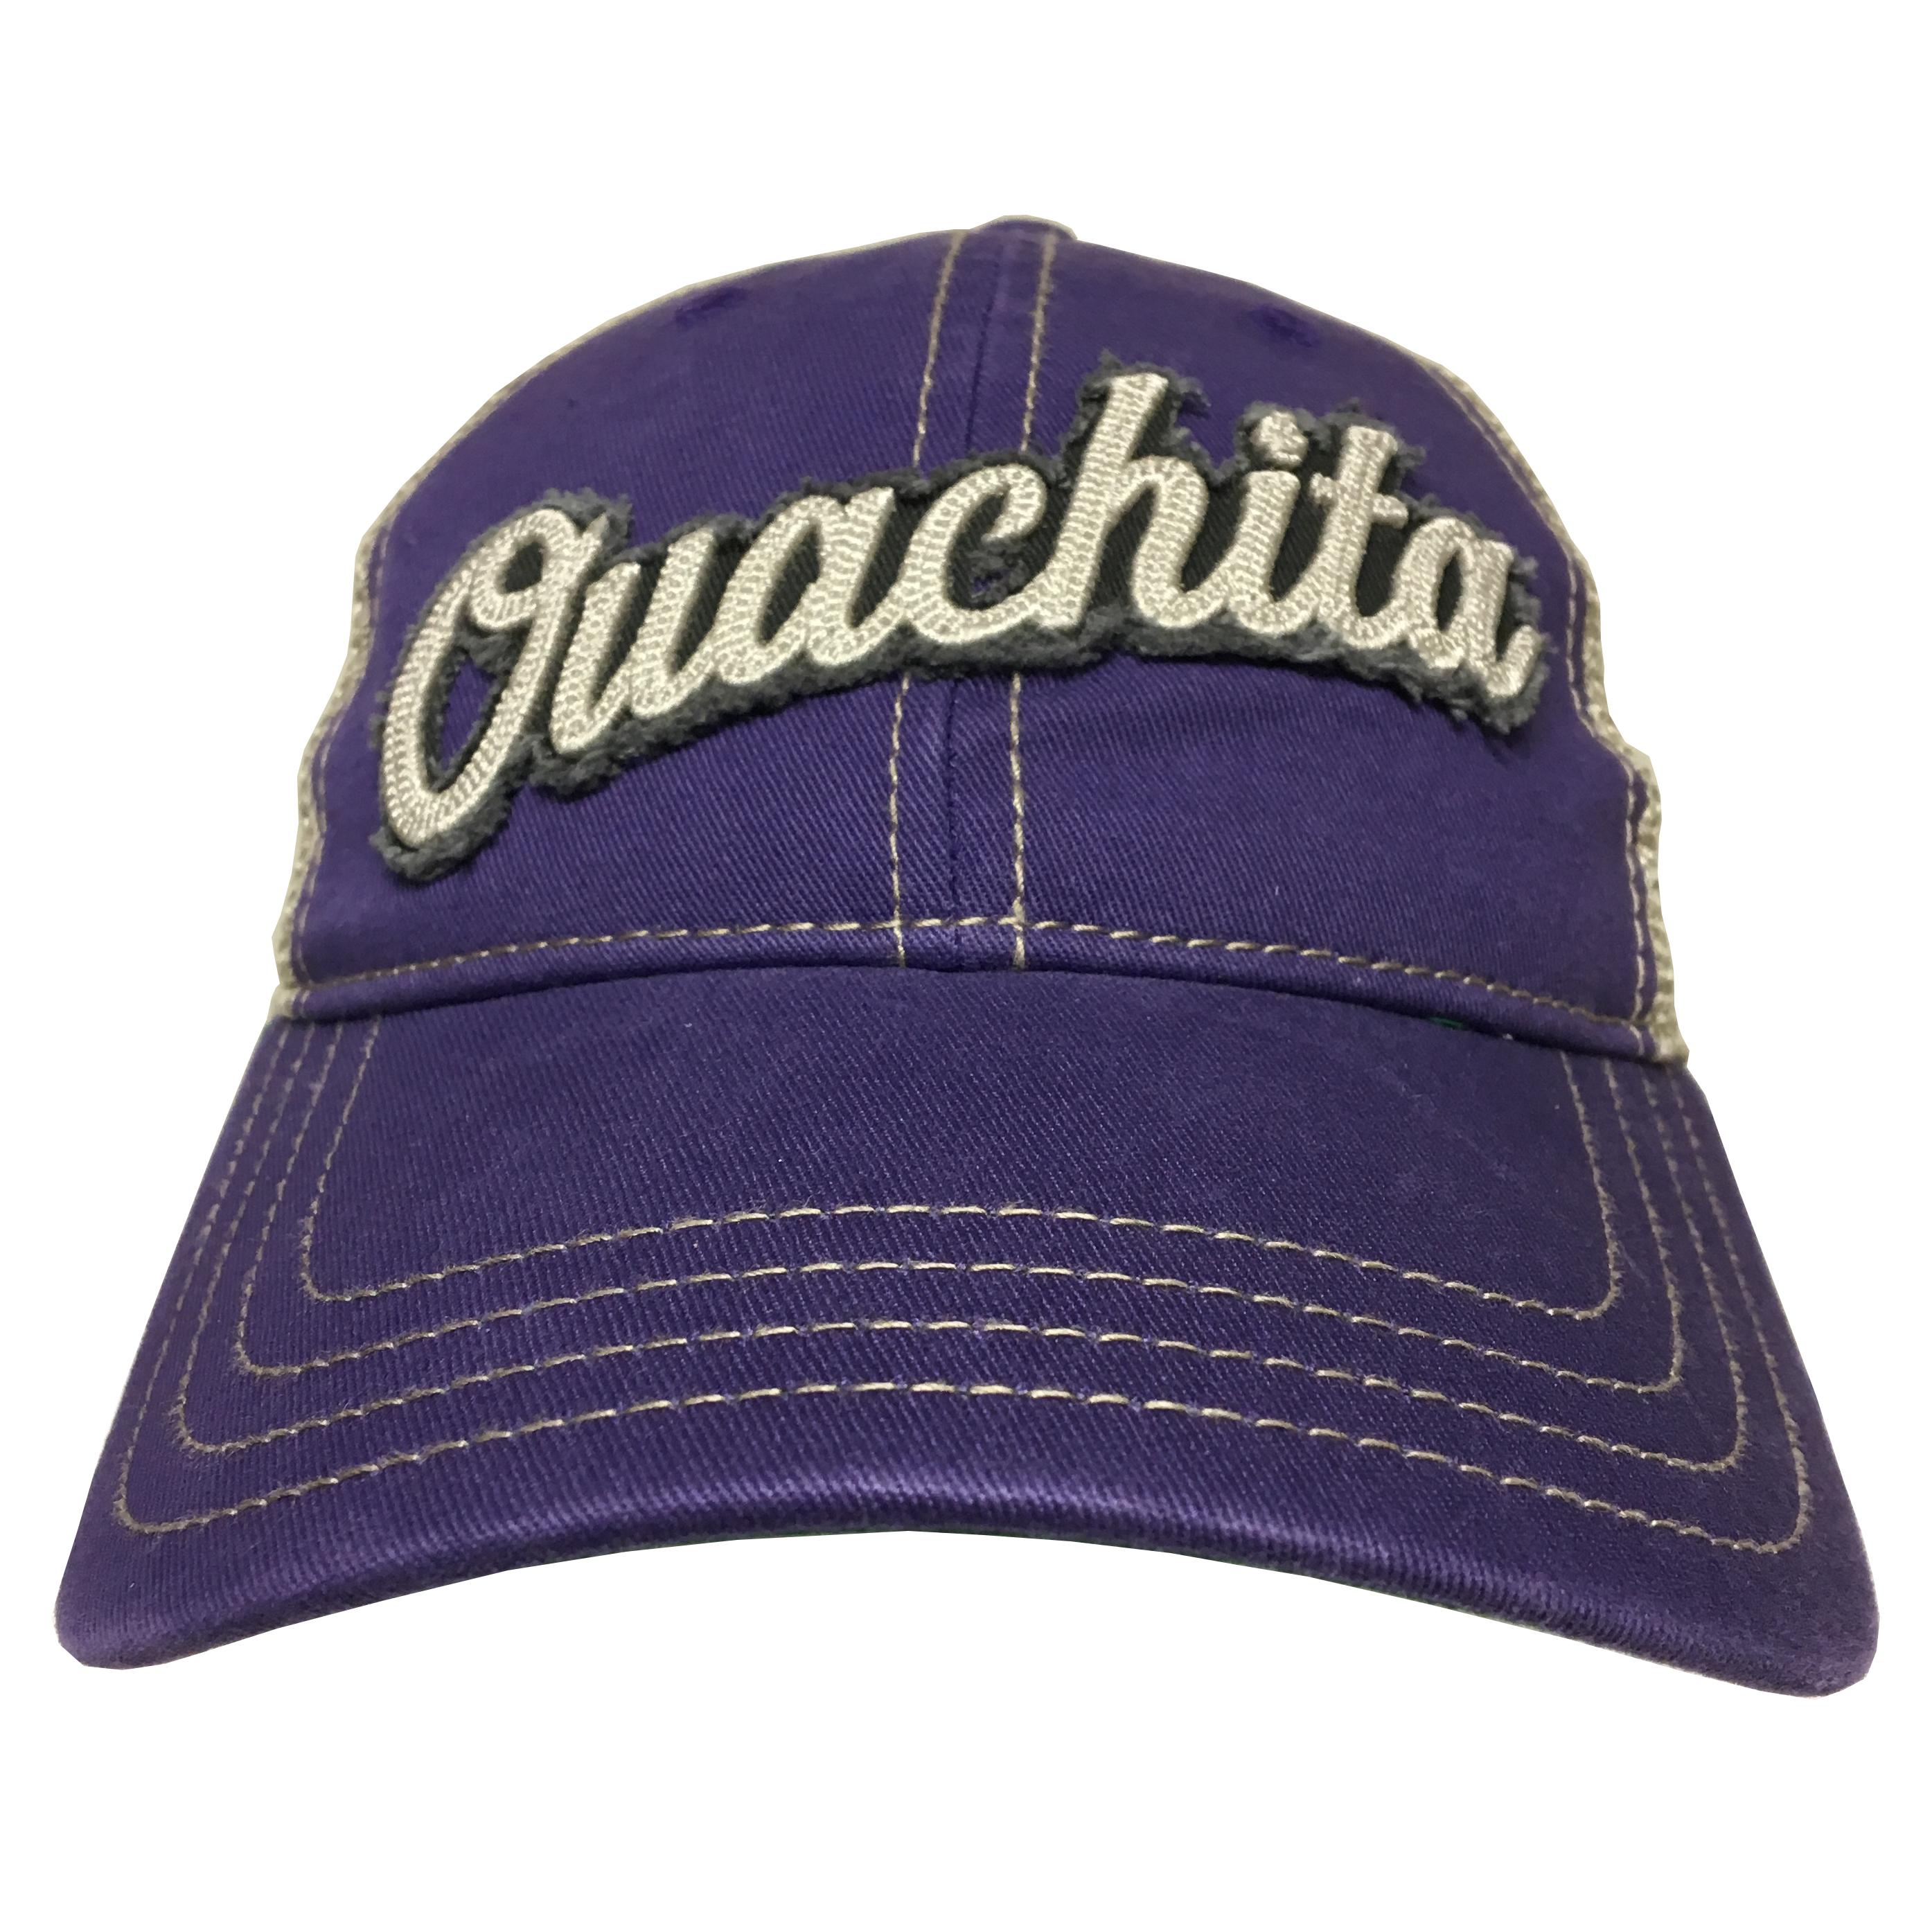 OUACHITA LEGEND HAT